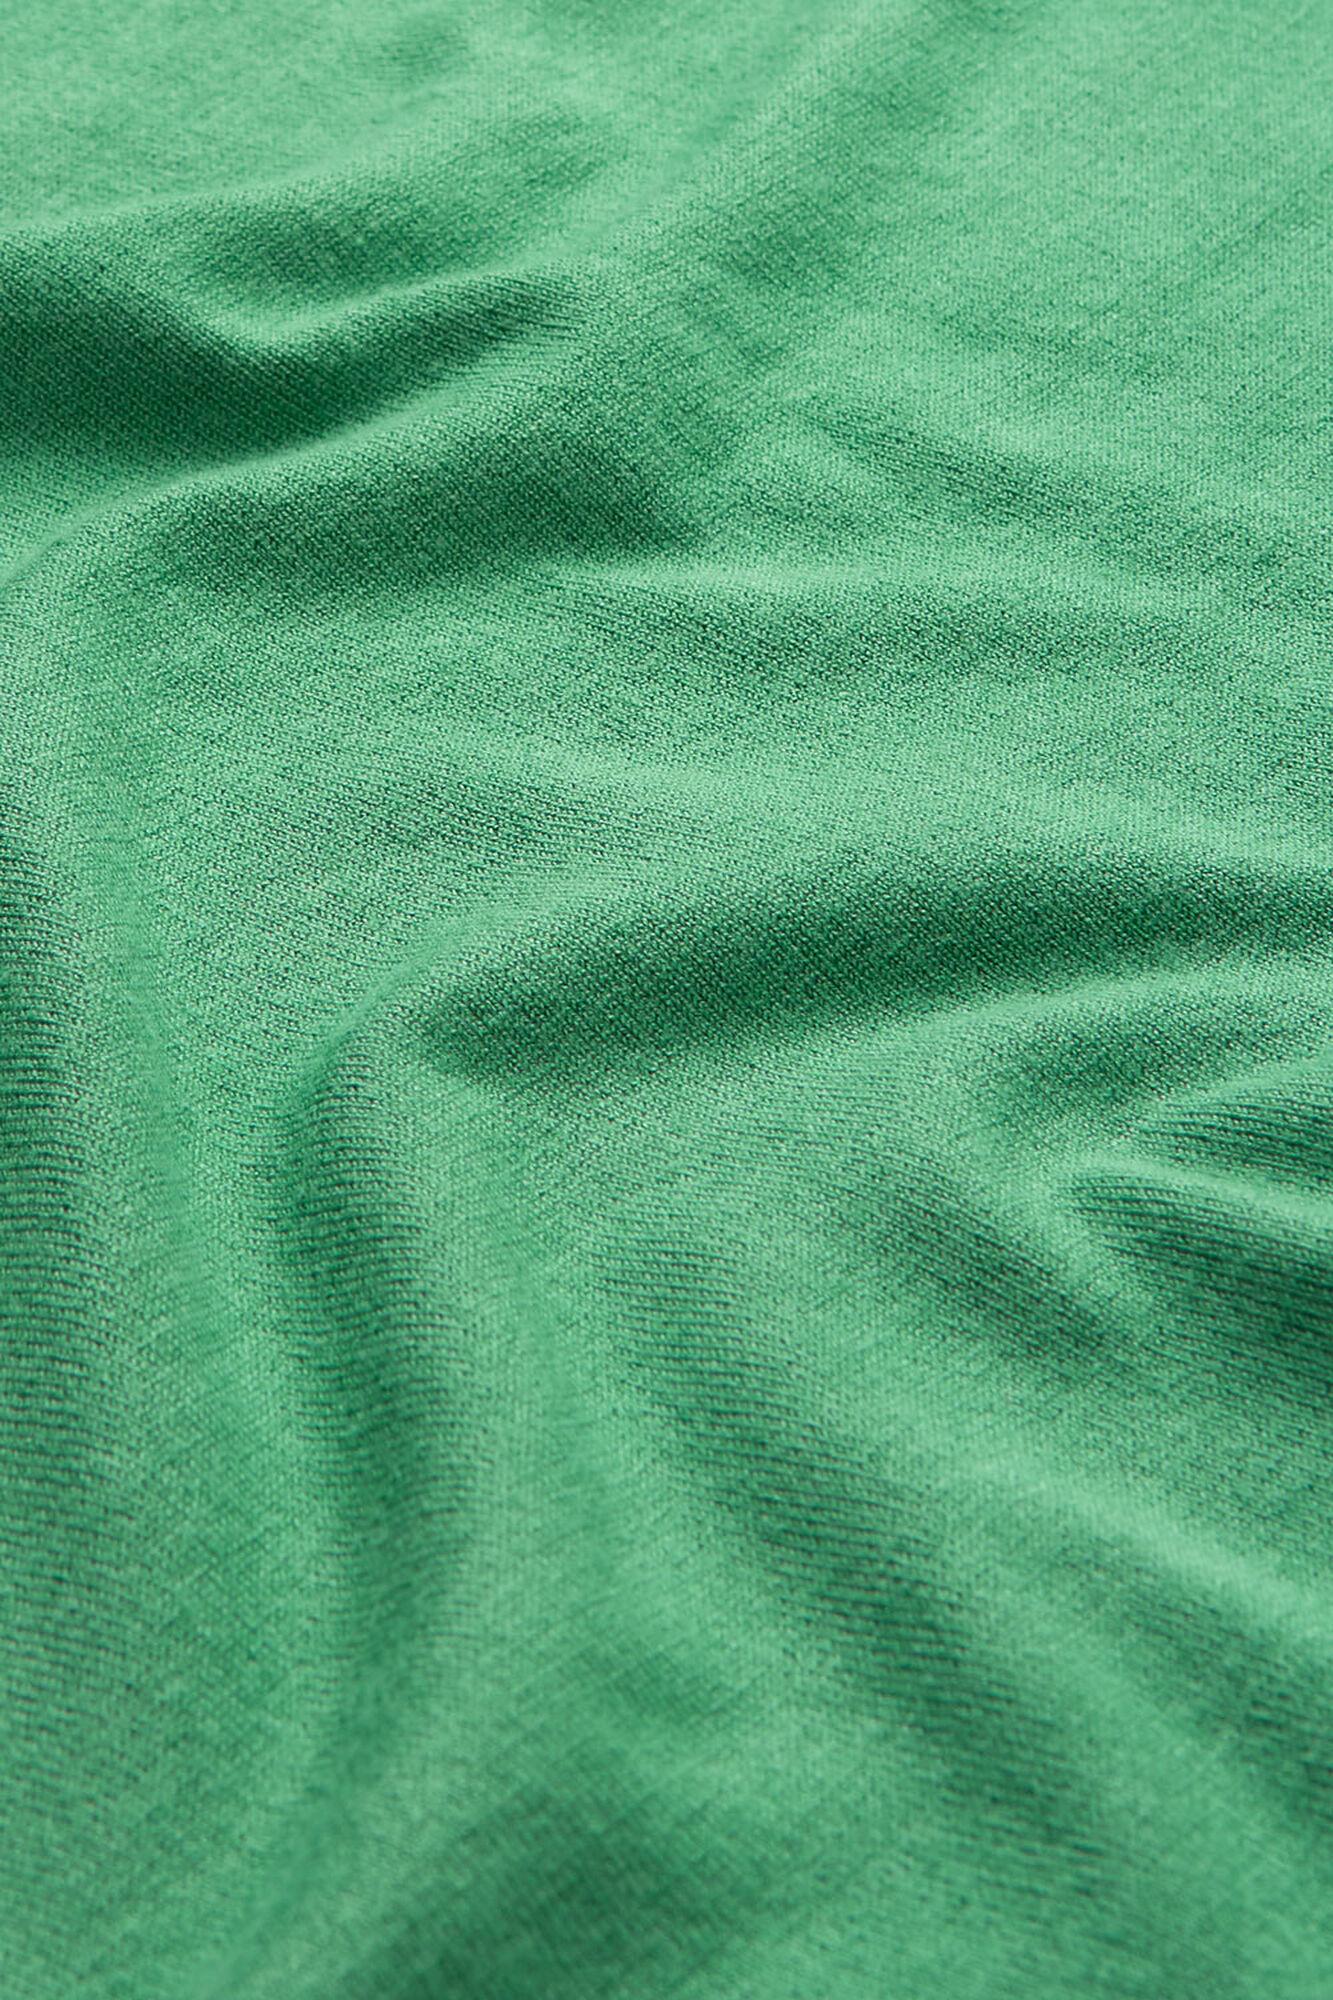 FANASI SHIRT, Bottle Green, hi-res